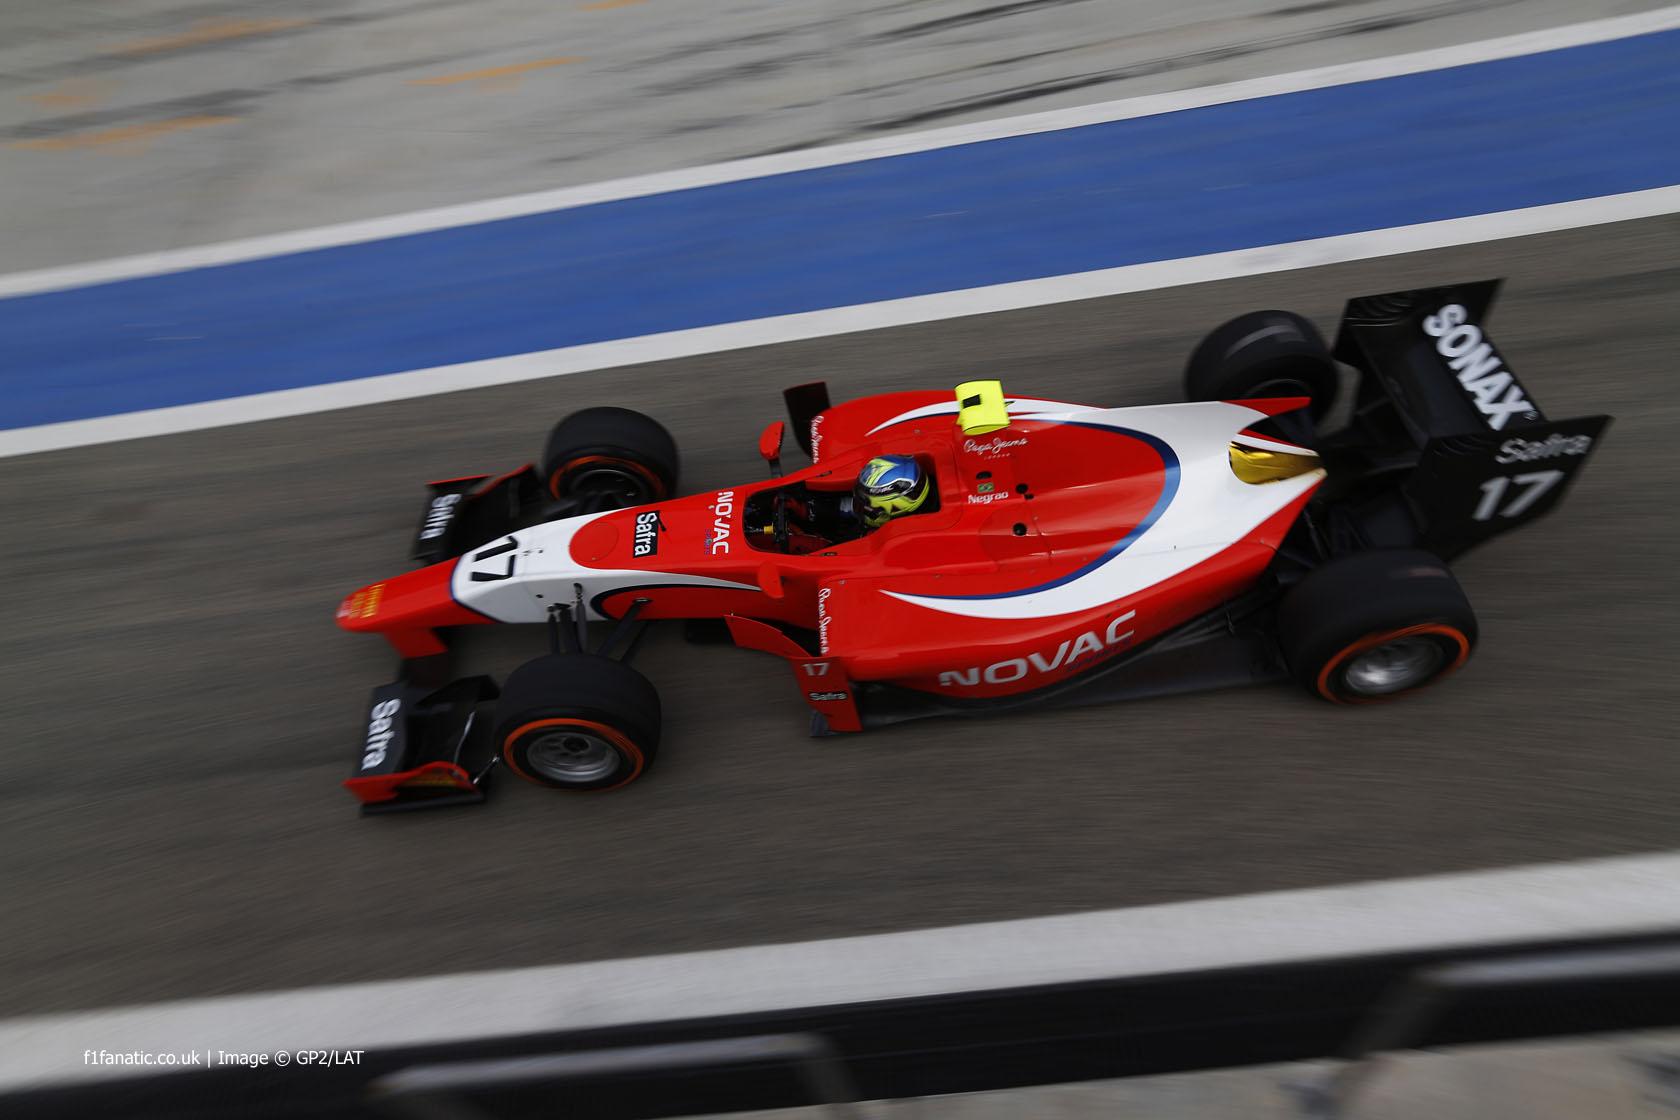 Andre Negrao, Arden, GP2, Bahrain, 2014